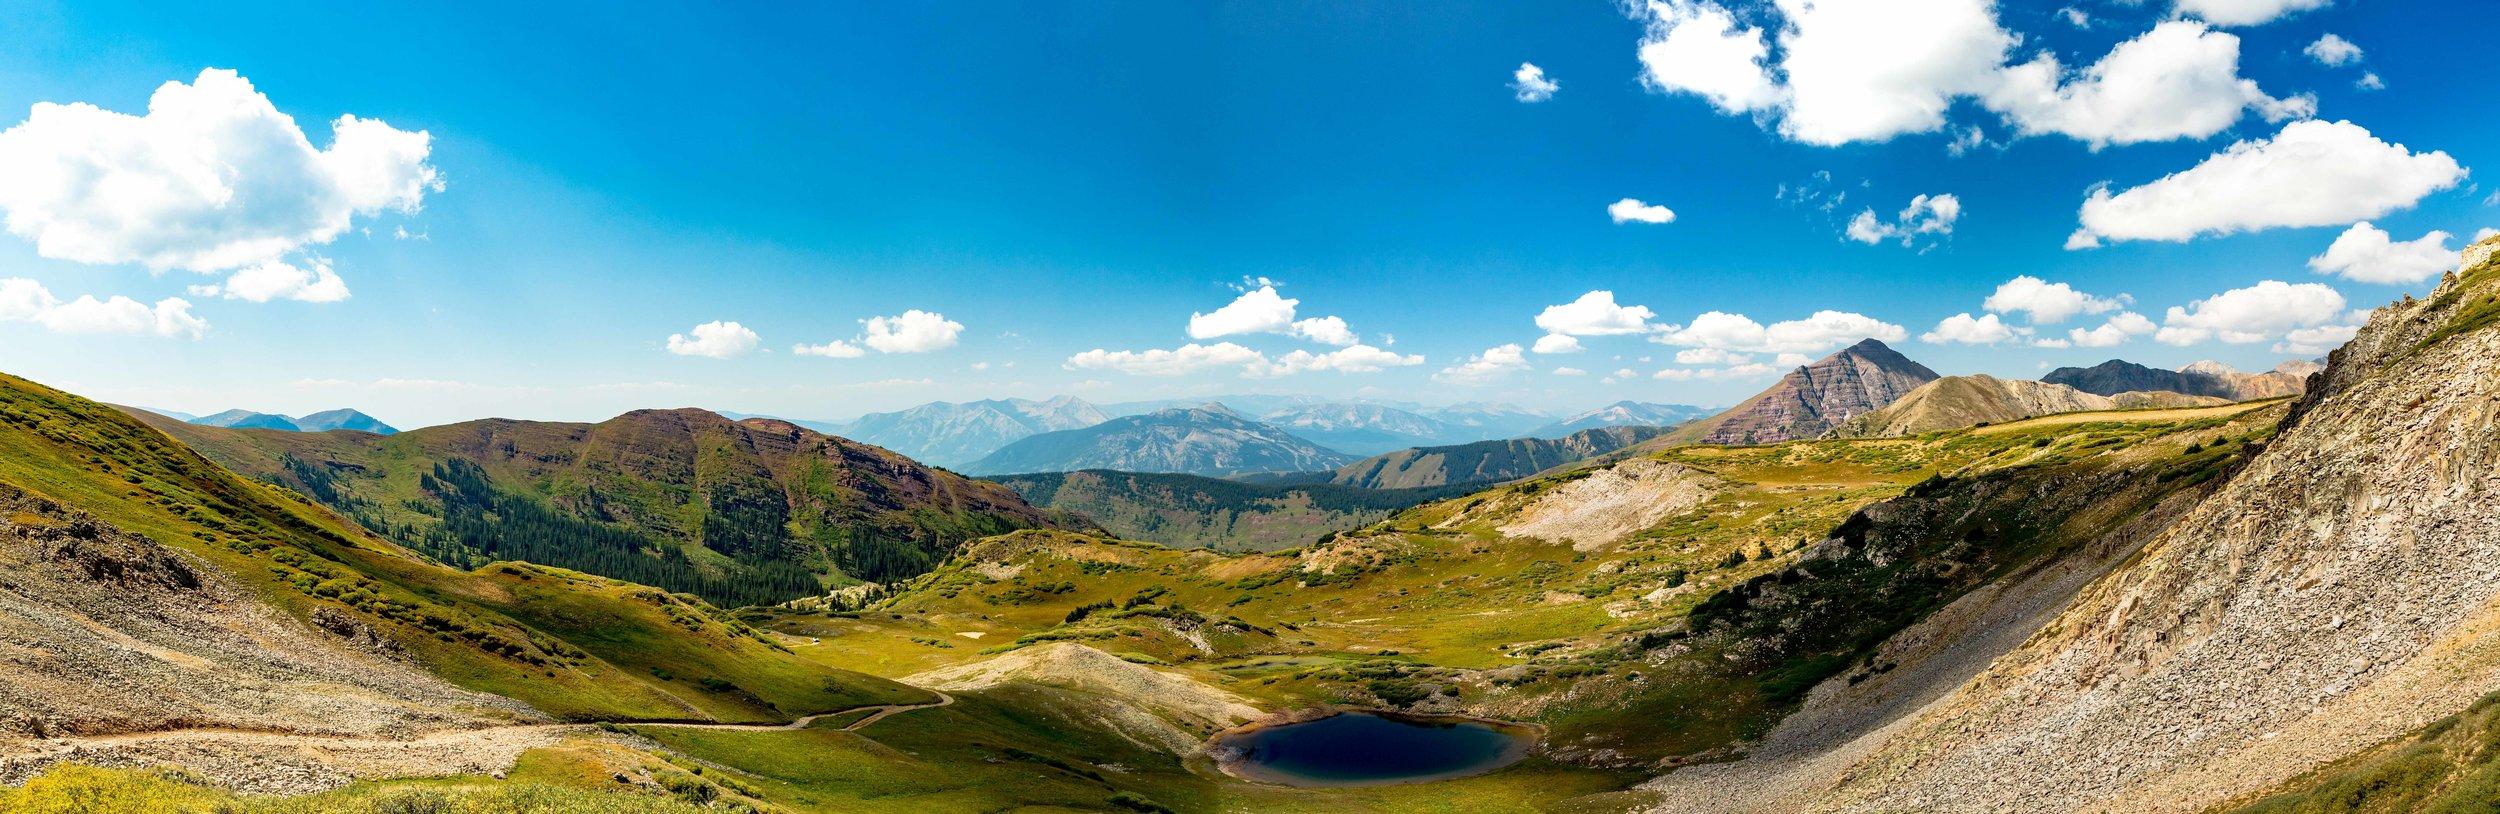 Teocalli Mtn.jpg